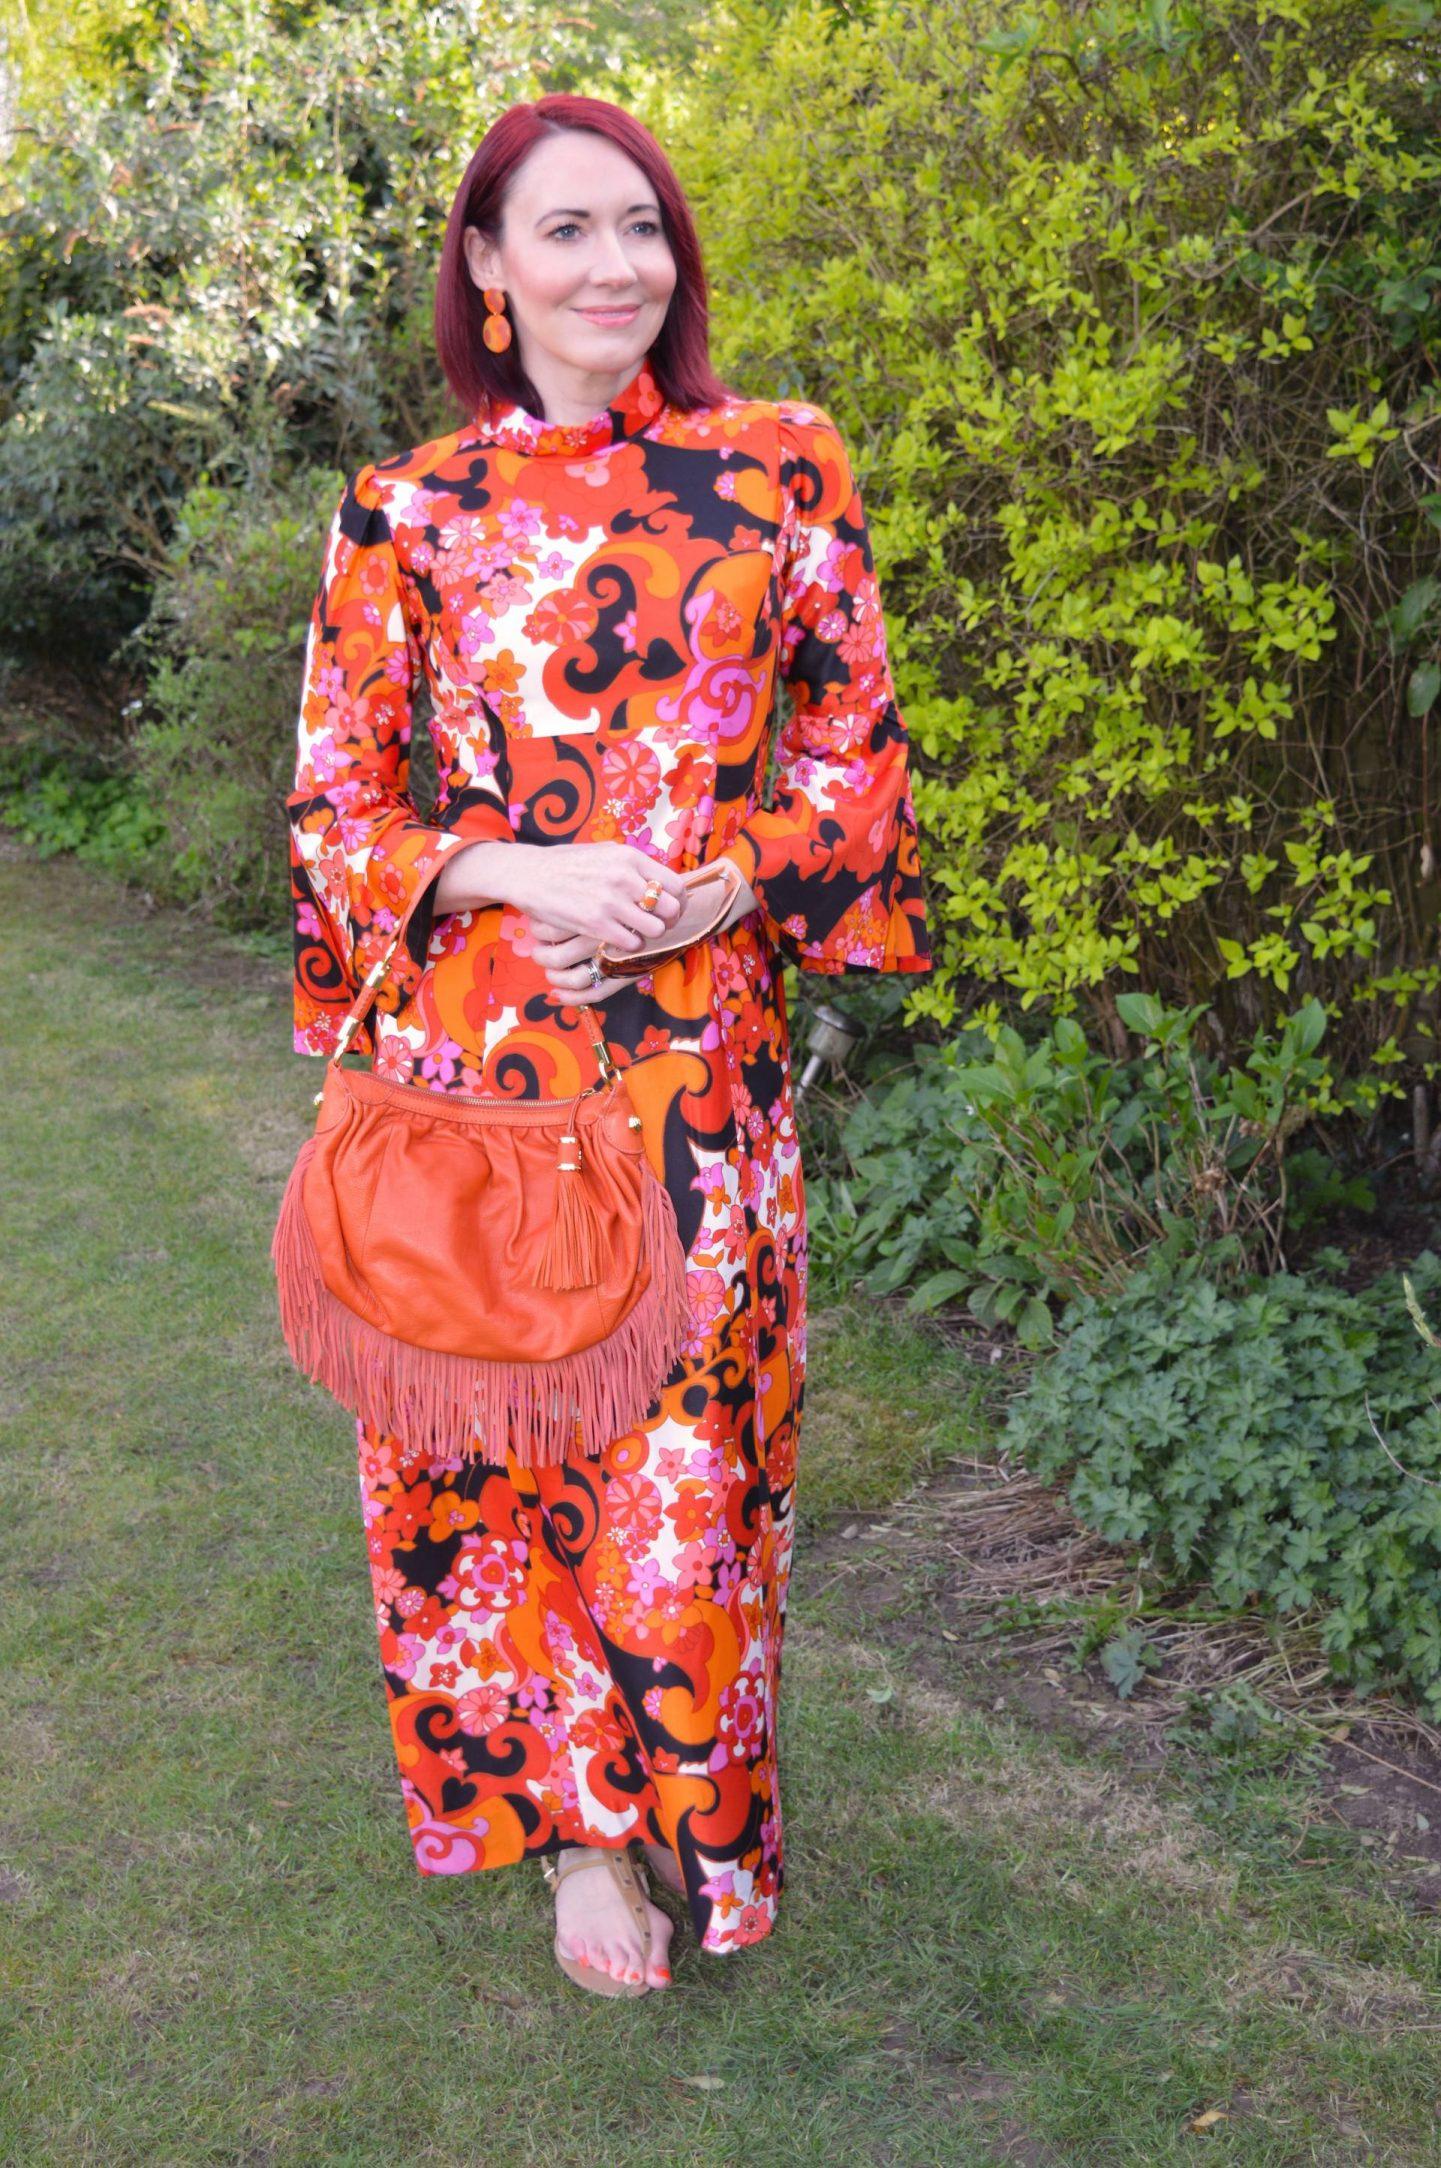 Orange Print Vintage Maxi Dress, Modalu orange fringed bag